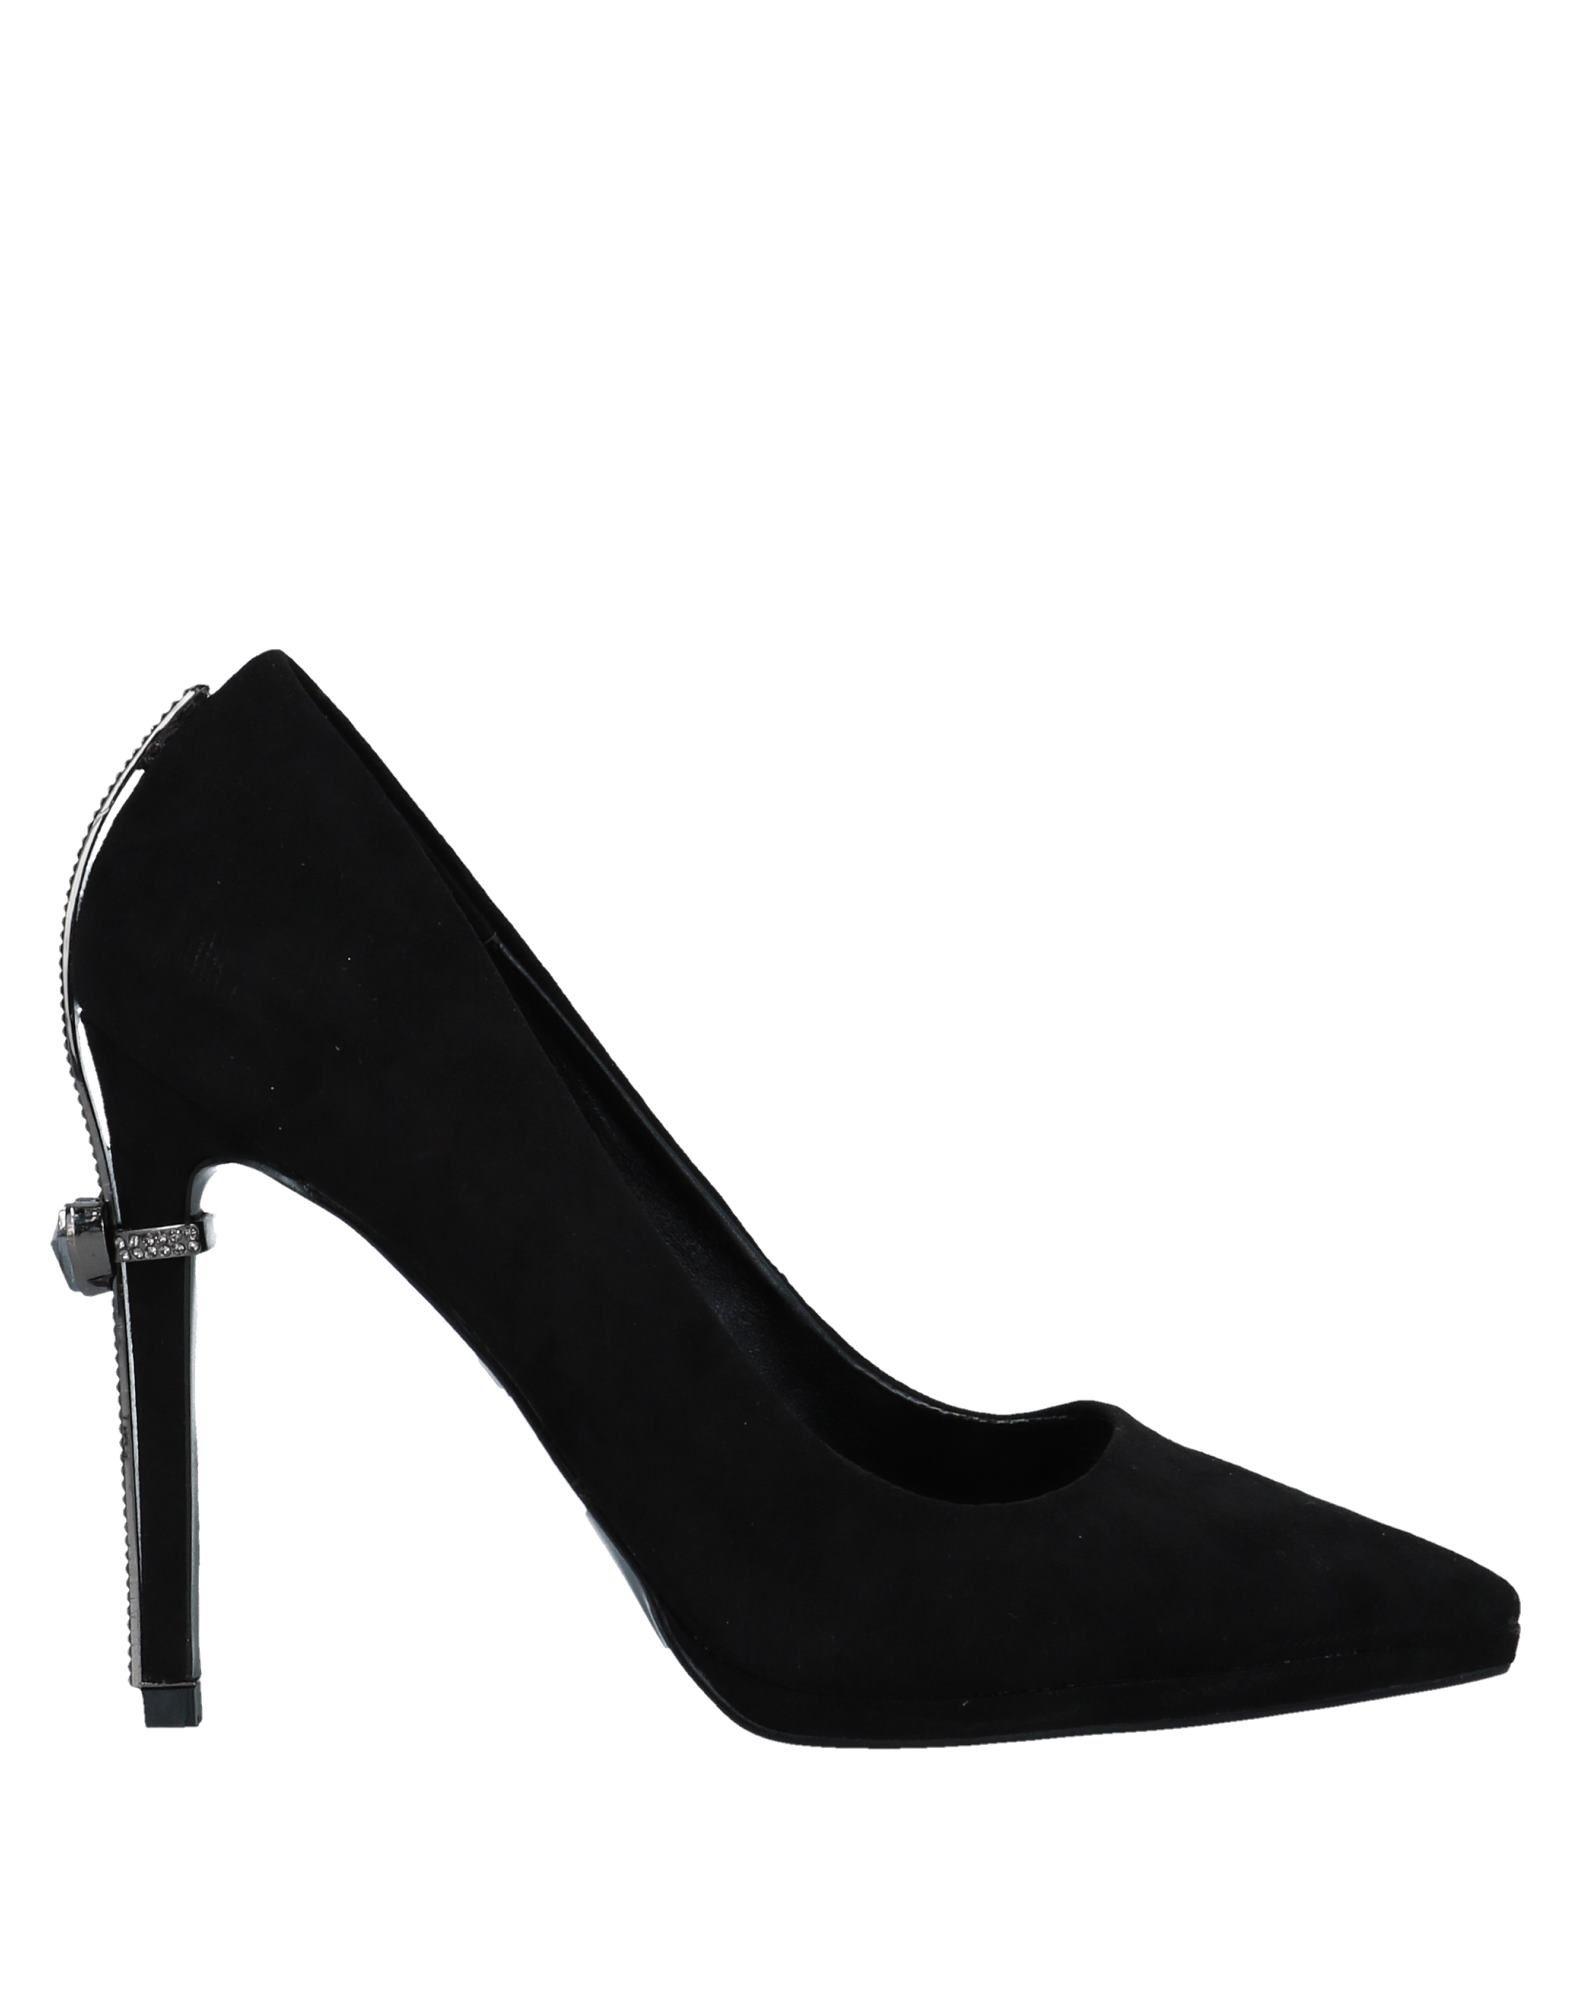 Ikaros Pumps Damen  11547122PL Schuhe Gute Qualität beliebte Schuhe 11547122PL 98f3c1